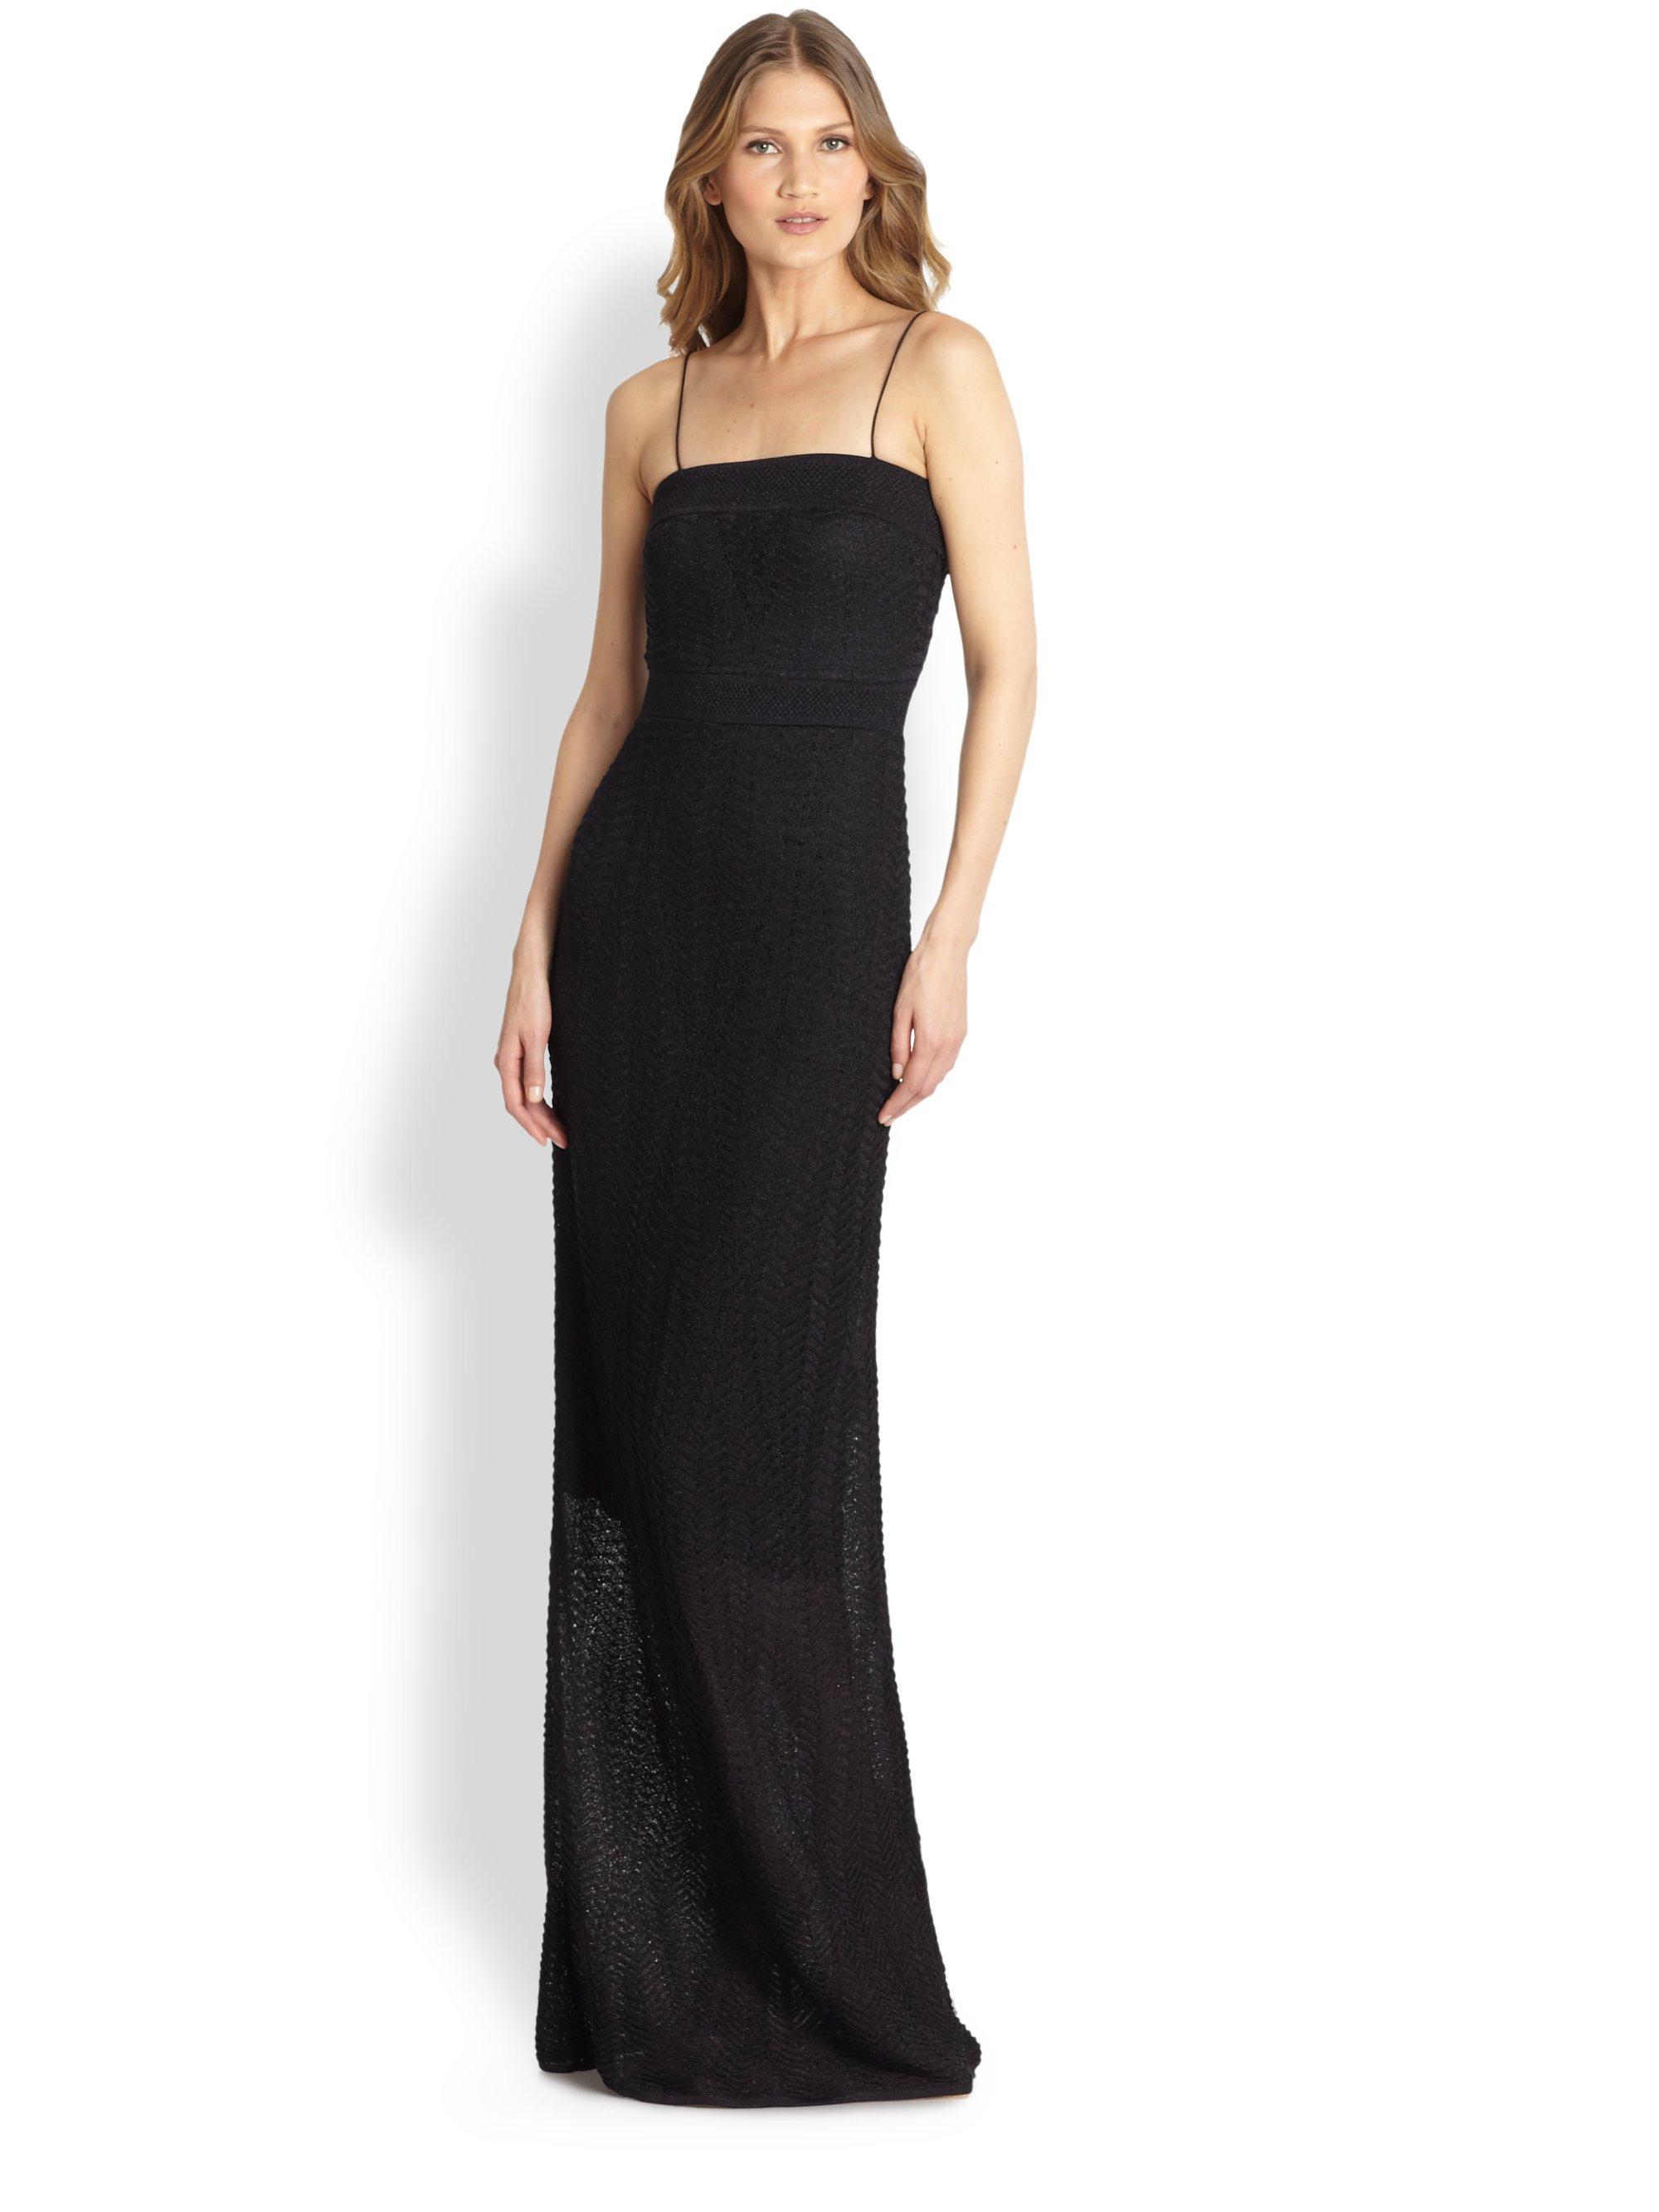 Black Strapless Long Maxi Dresses